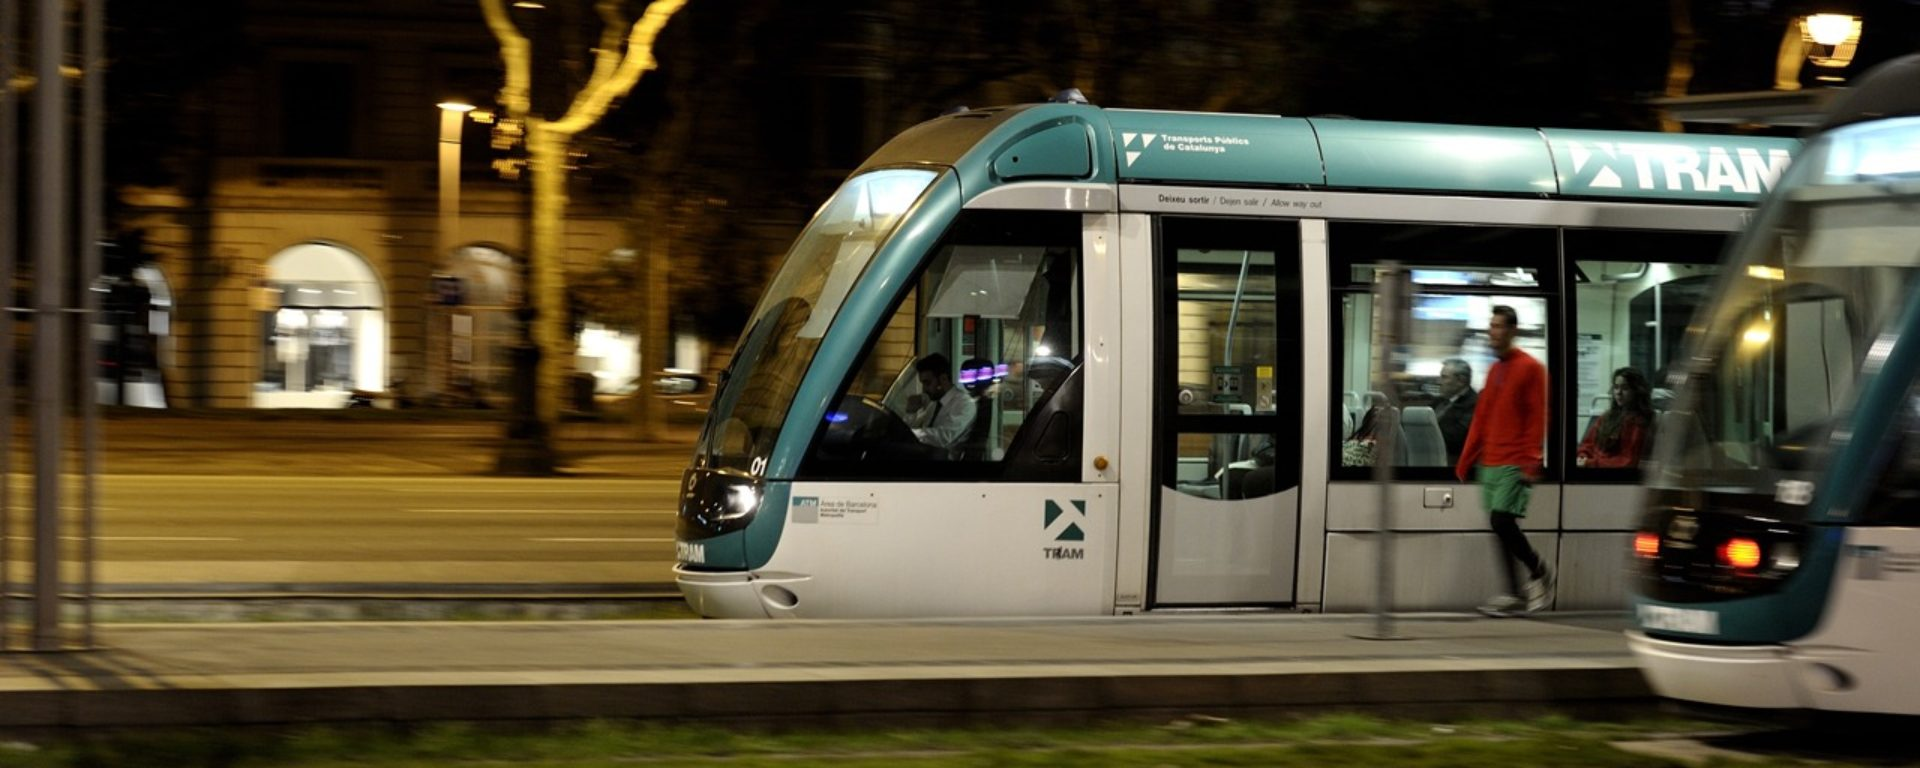 tram,train,barcelone,mobilité,transdev